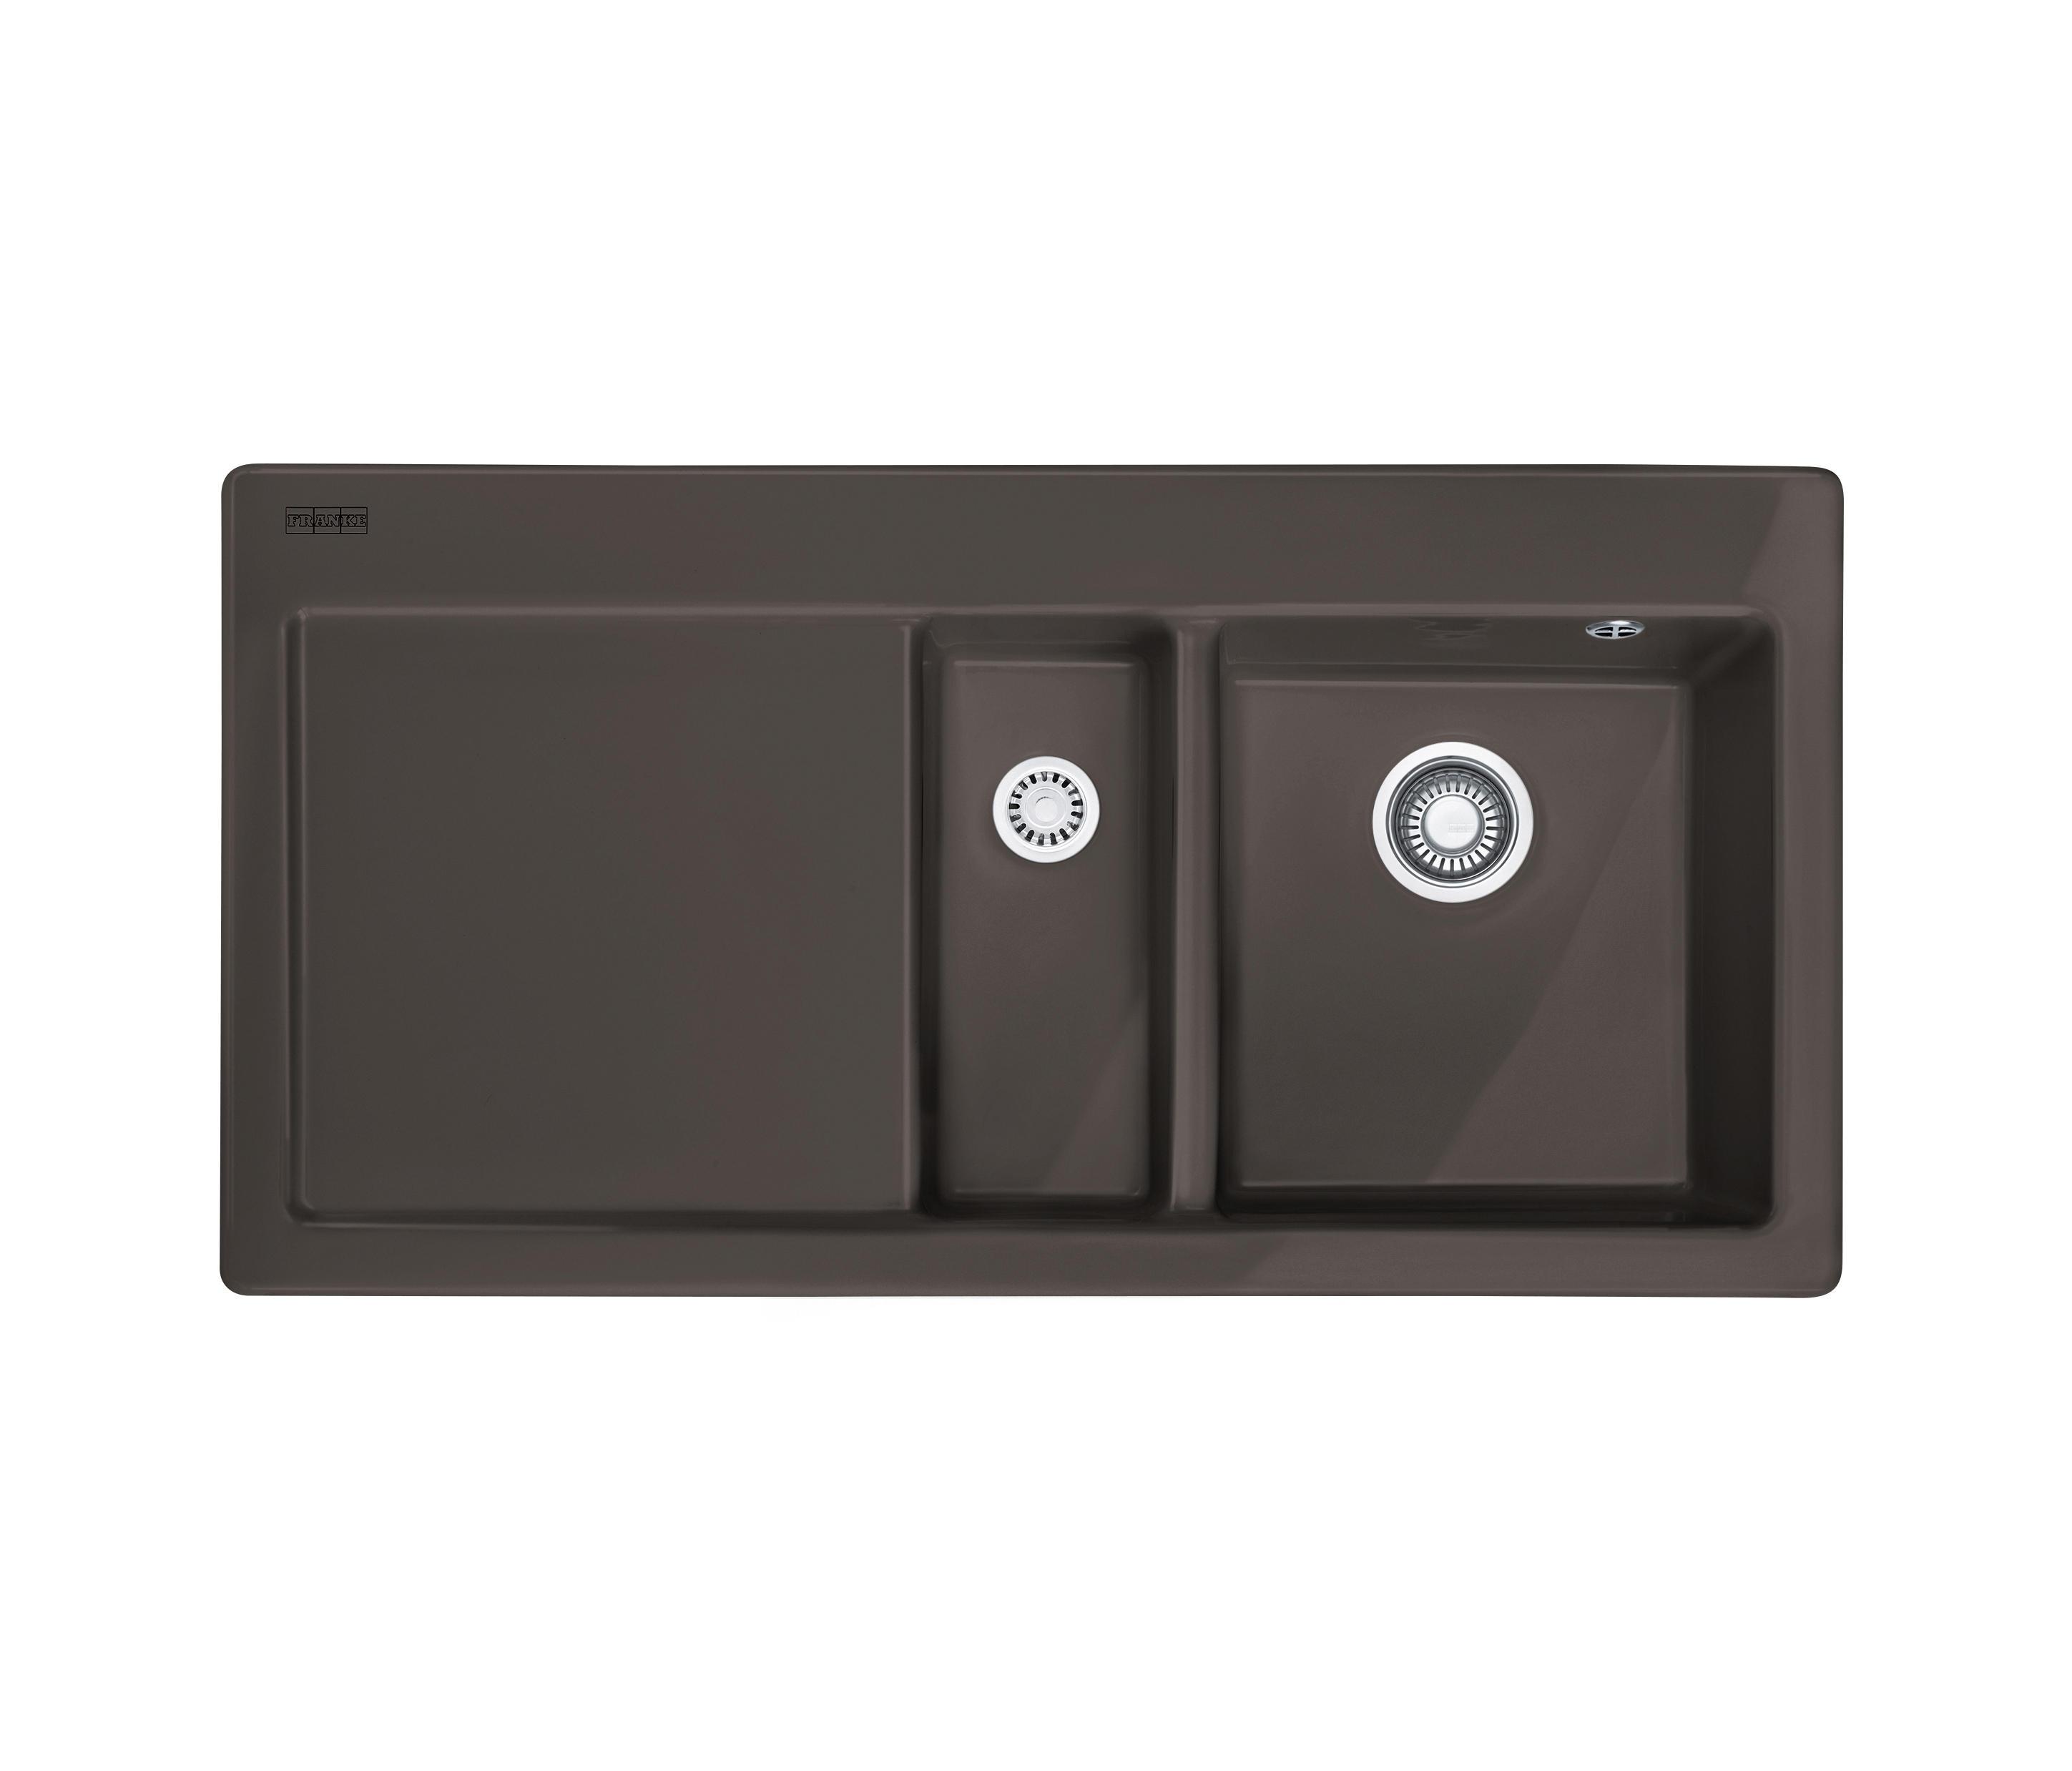 mythos evier mtk 651 100 c ramique graphit viers de. Black Bedroom Furniture Sets. Home Design Ideas